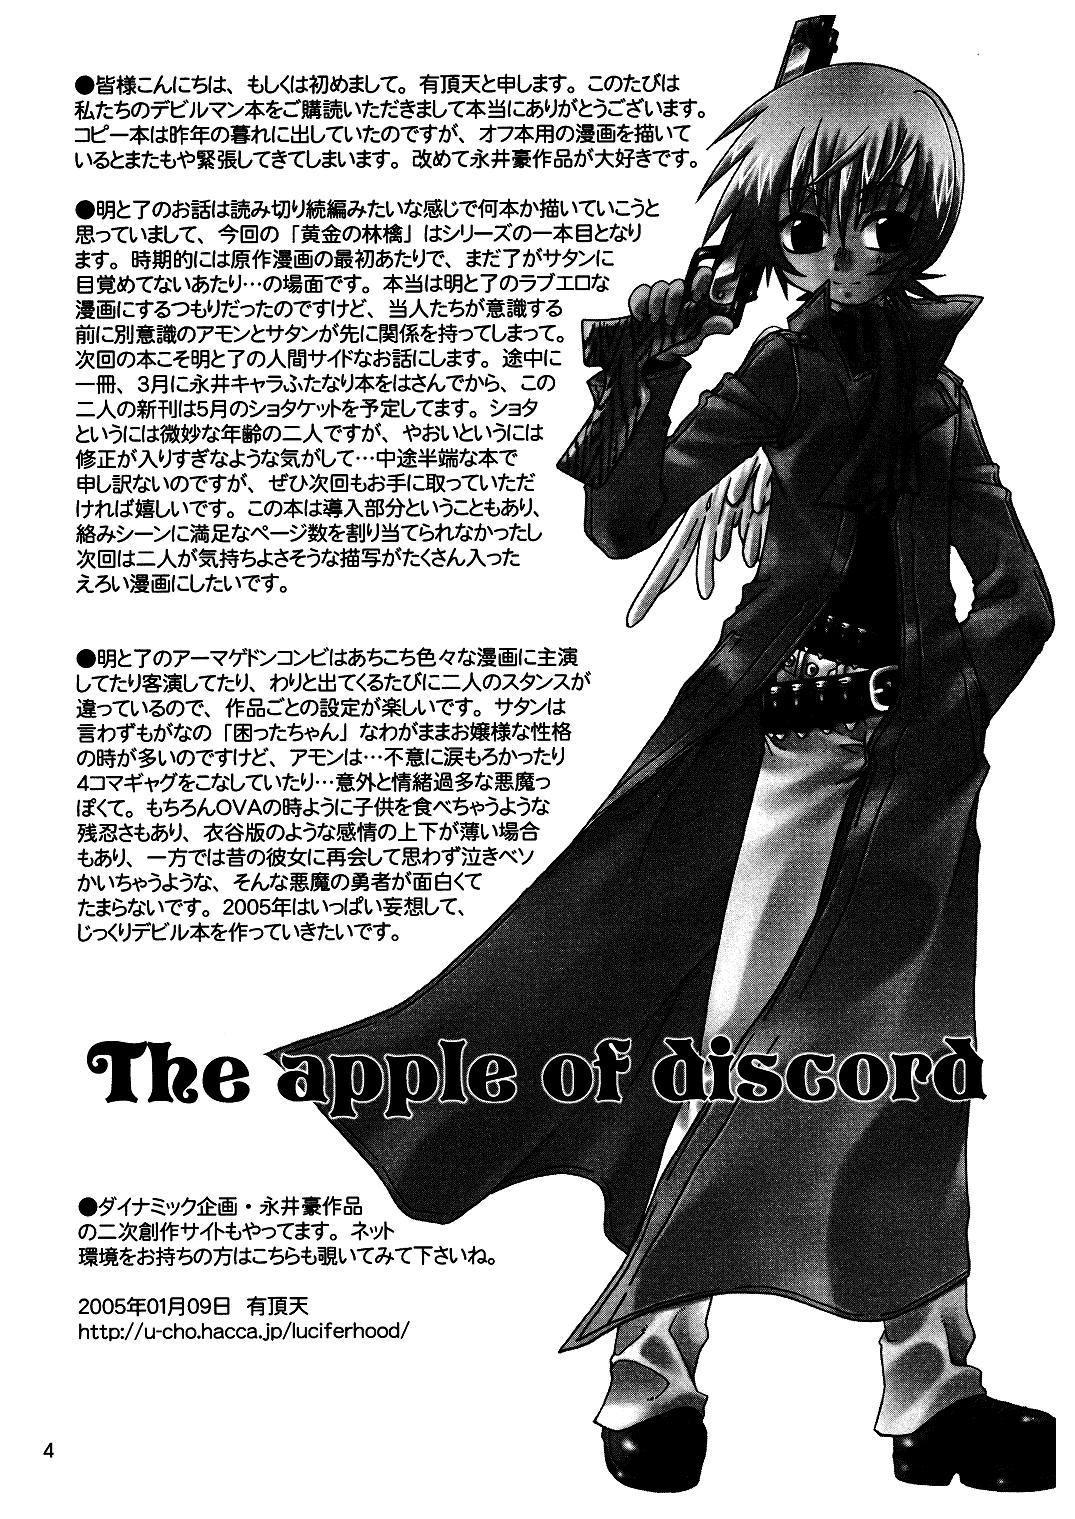 Ougon no Ringo - The Apple of Discord 2